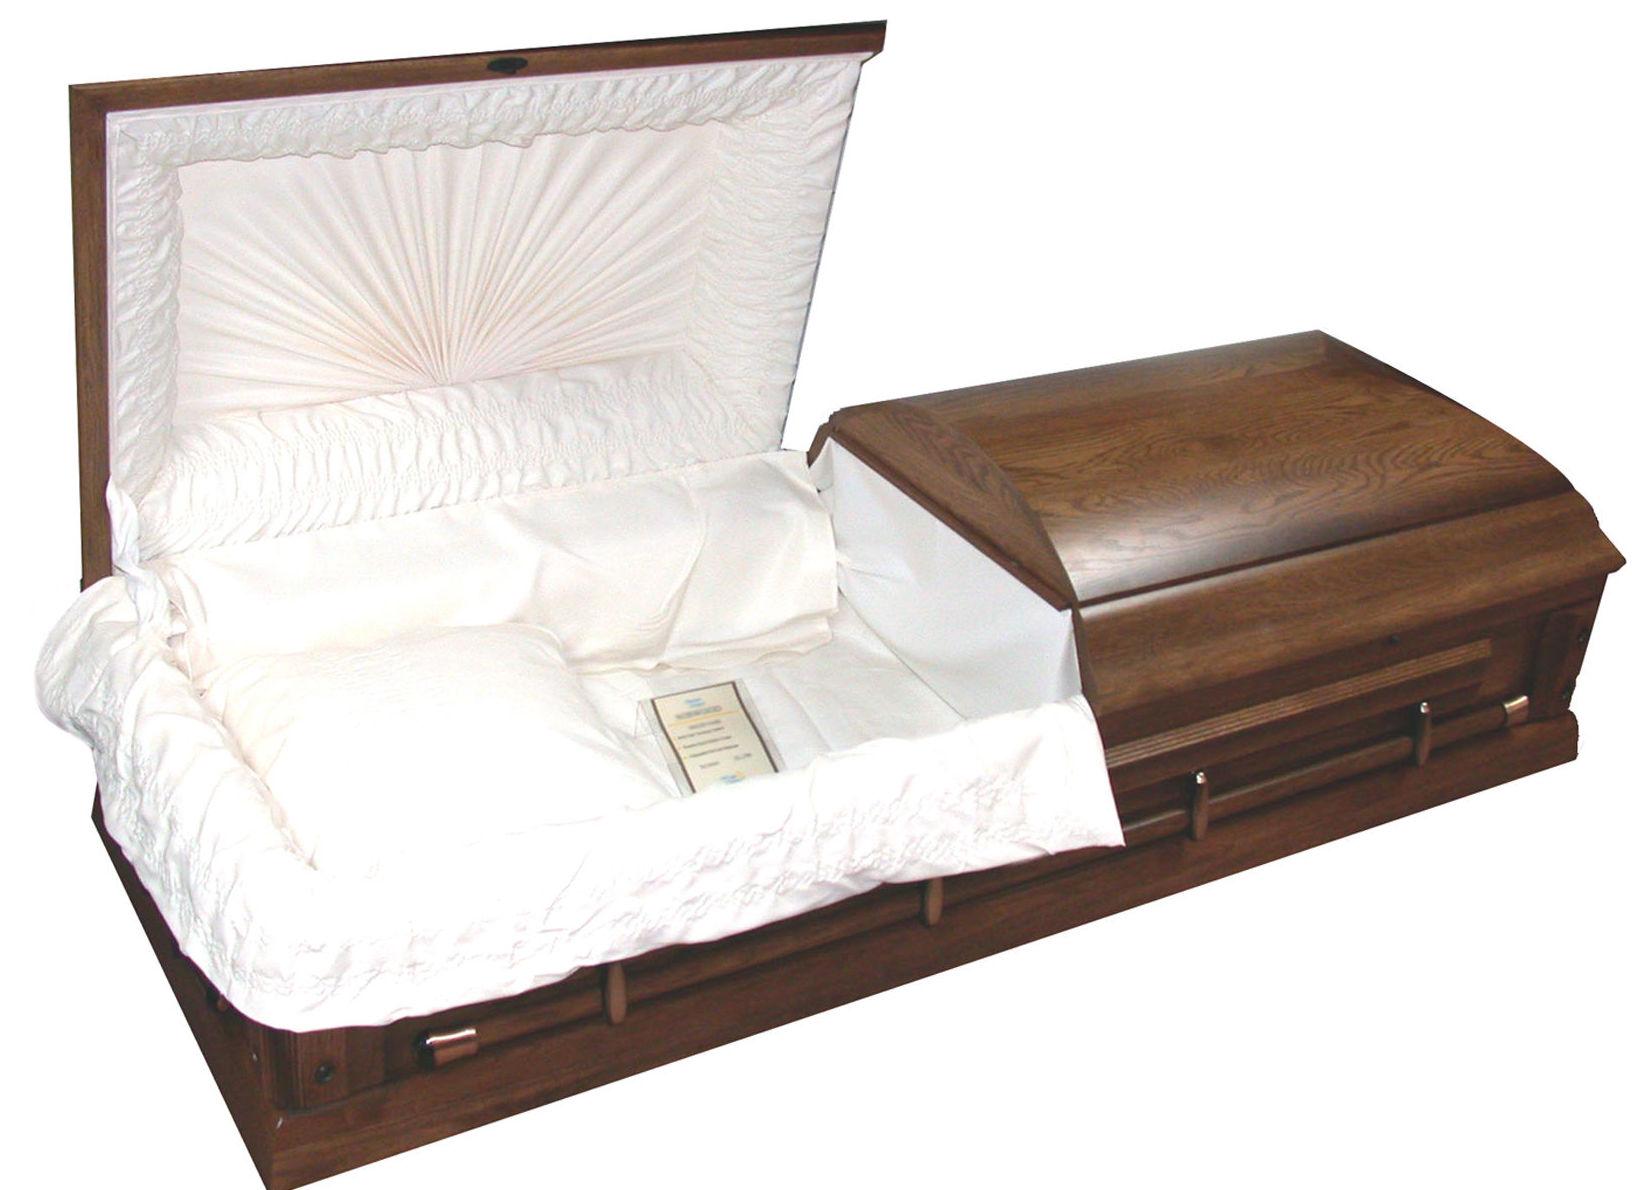 Funeraria Tanatorio, 24h del día a su disposición pésames, velatorios, esquelas....